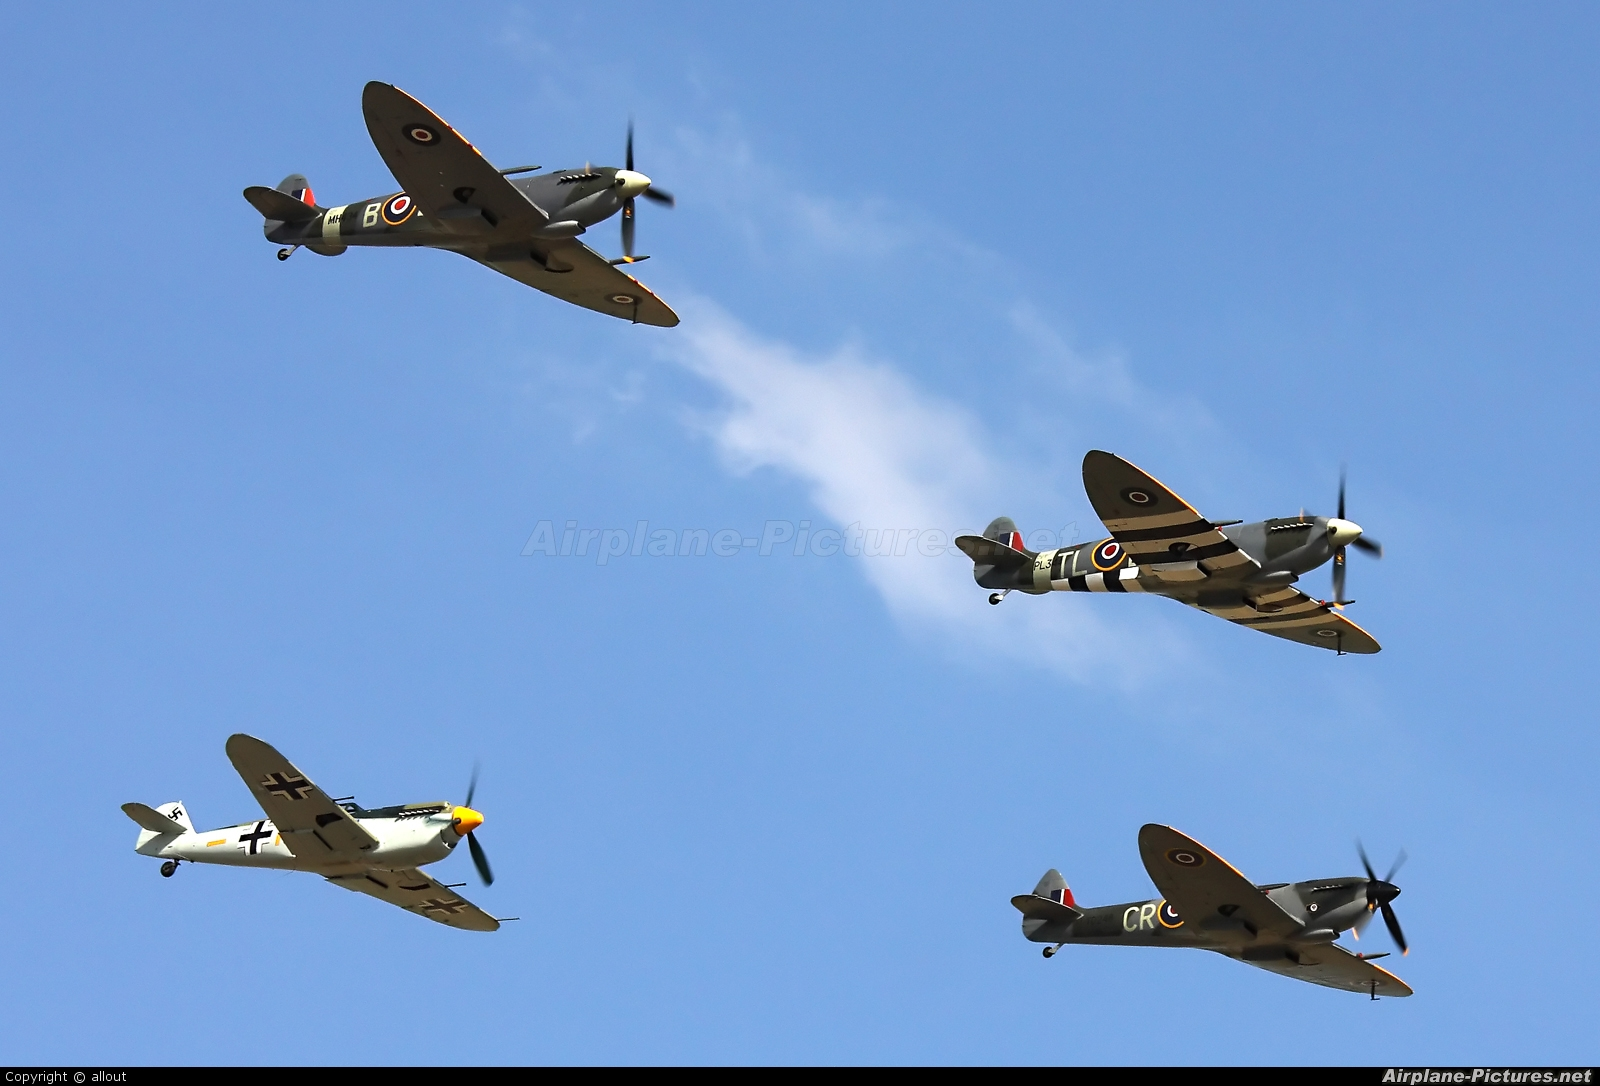 Spitfire G-IXCC aircraft at Duxford